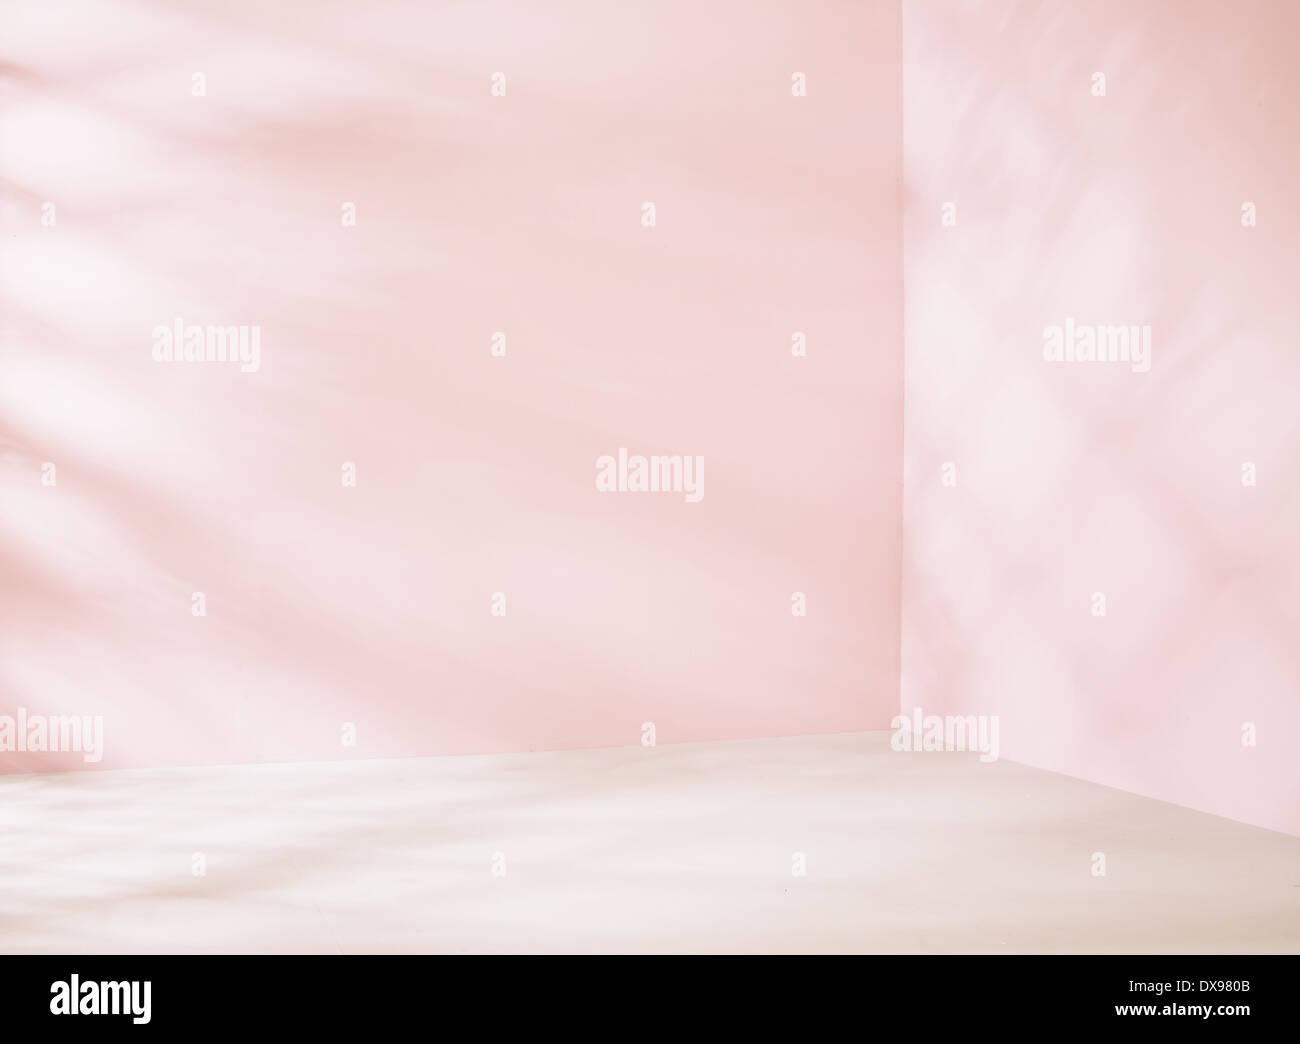 Kleinen leeren Platz in rosa Farbton Stockbild